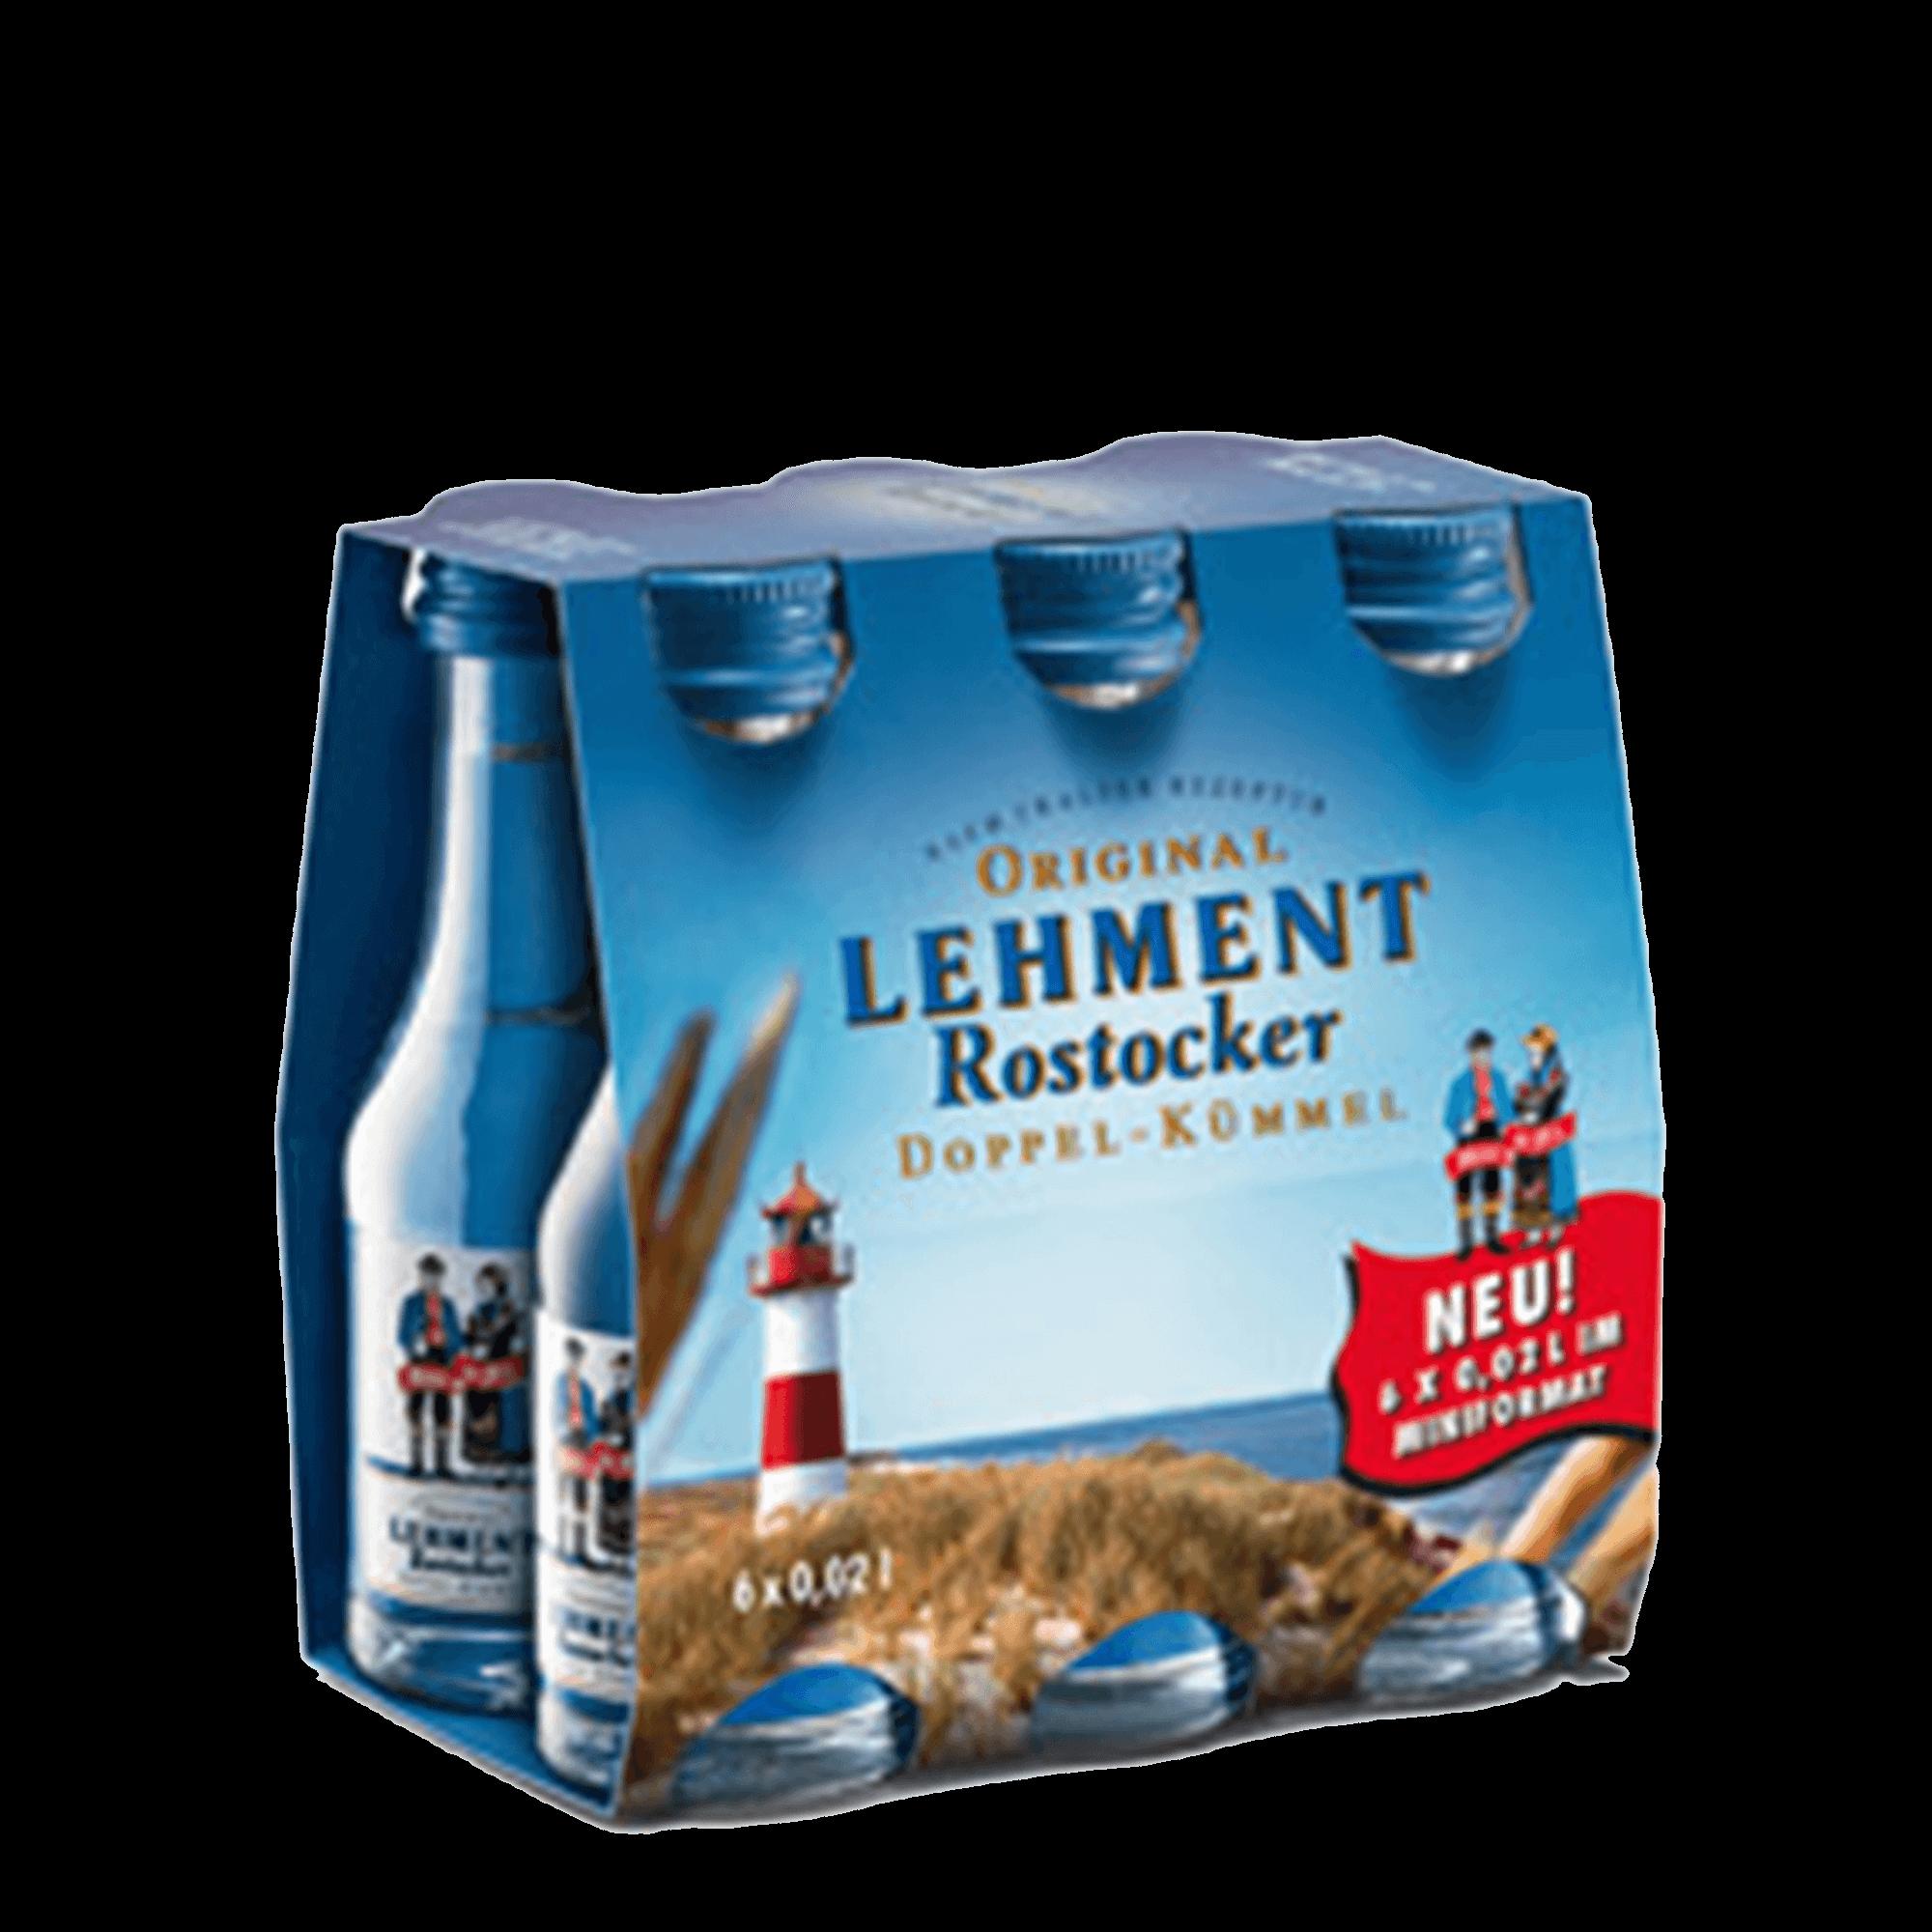 Original Lehment Rostocker Doppel-Kümmel 6x0,02l